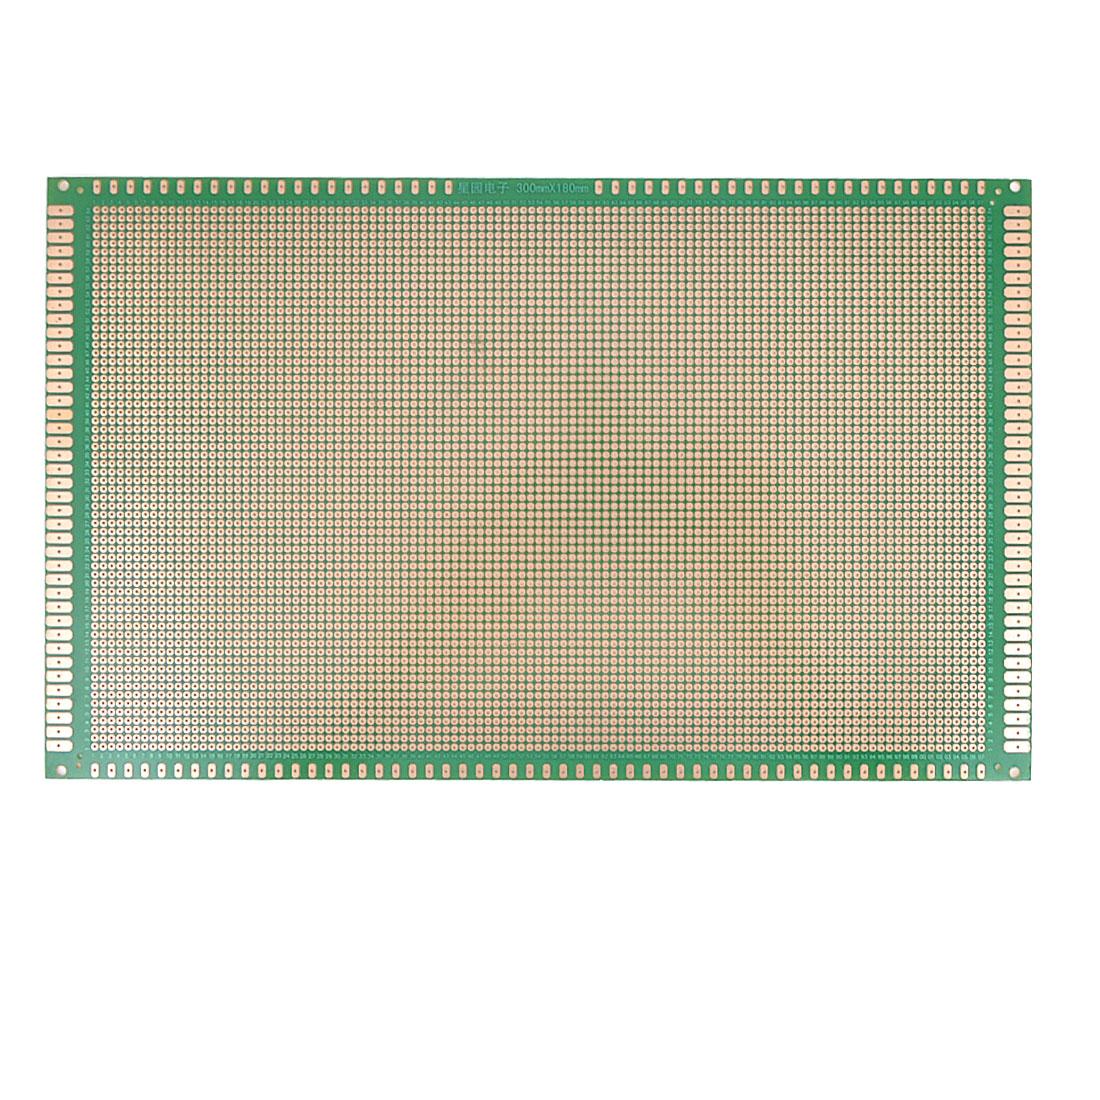 2.54mm Pitch PCB Board Copper Prototype Breadboard One Side 30cmx18cm Green